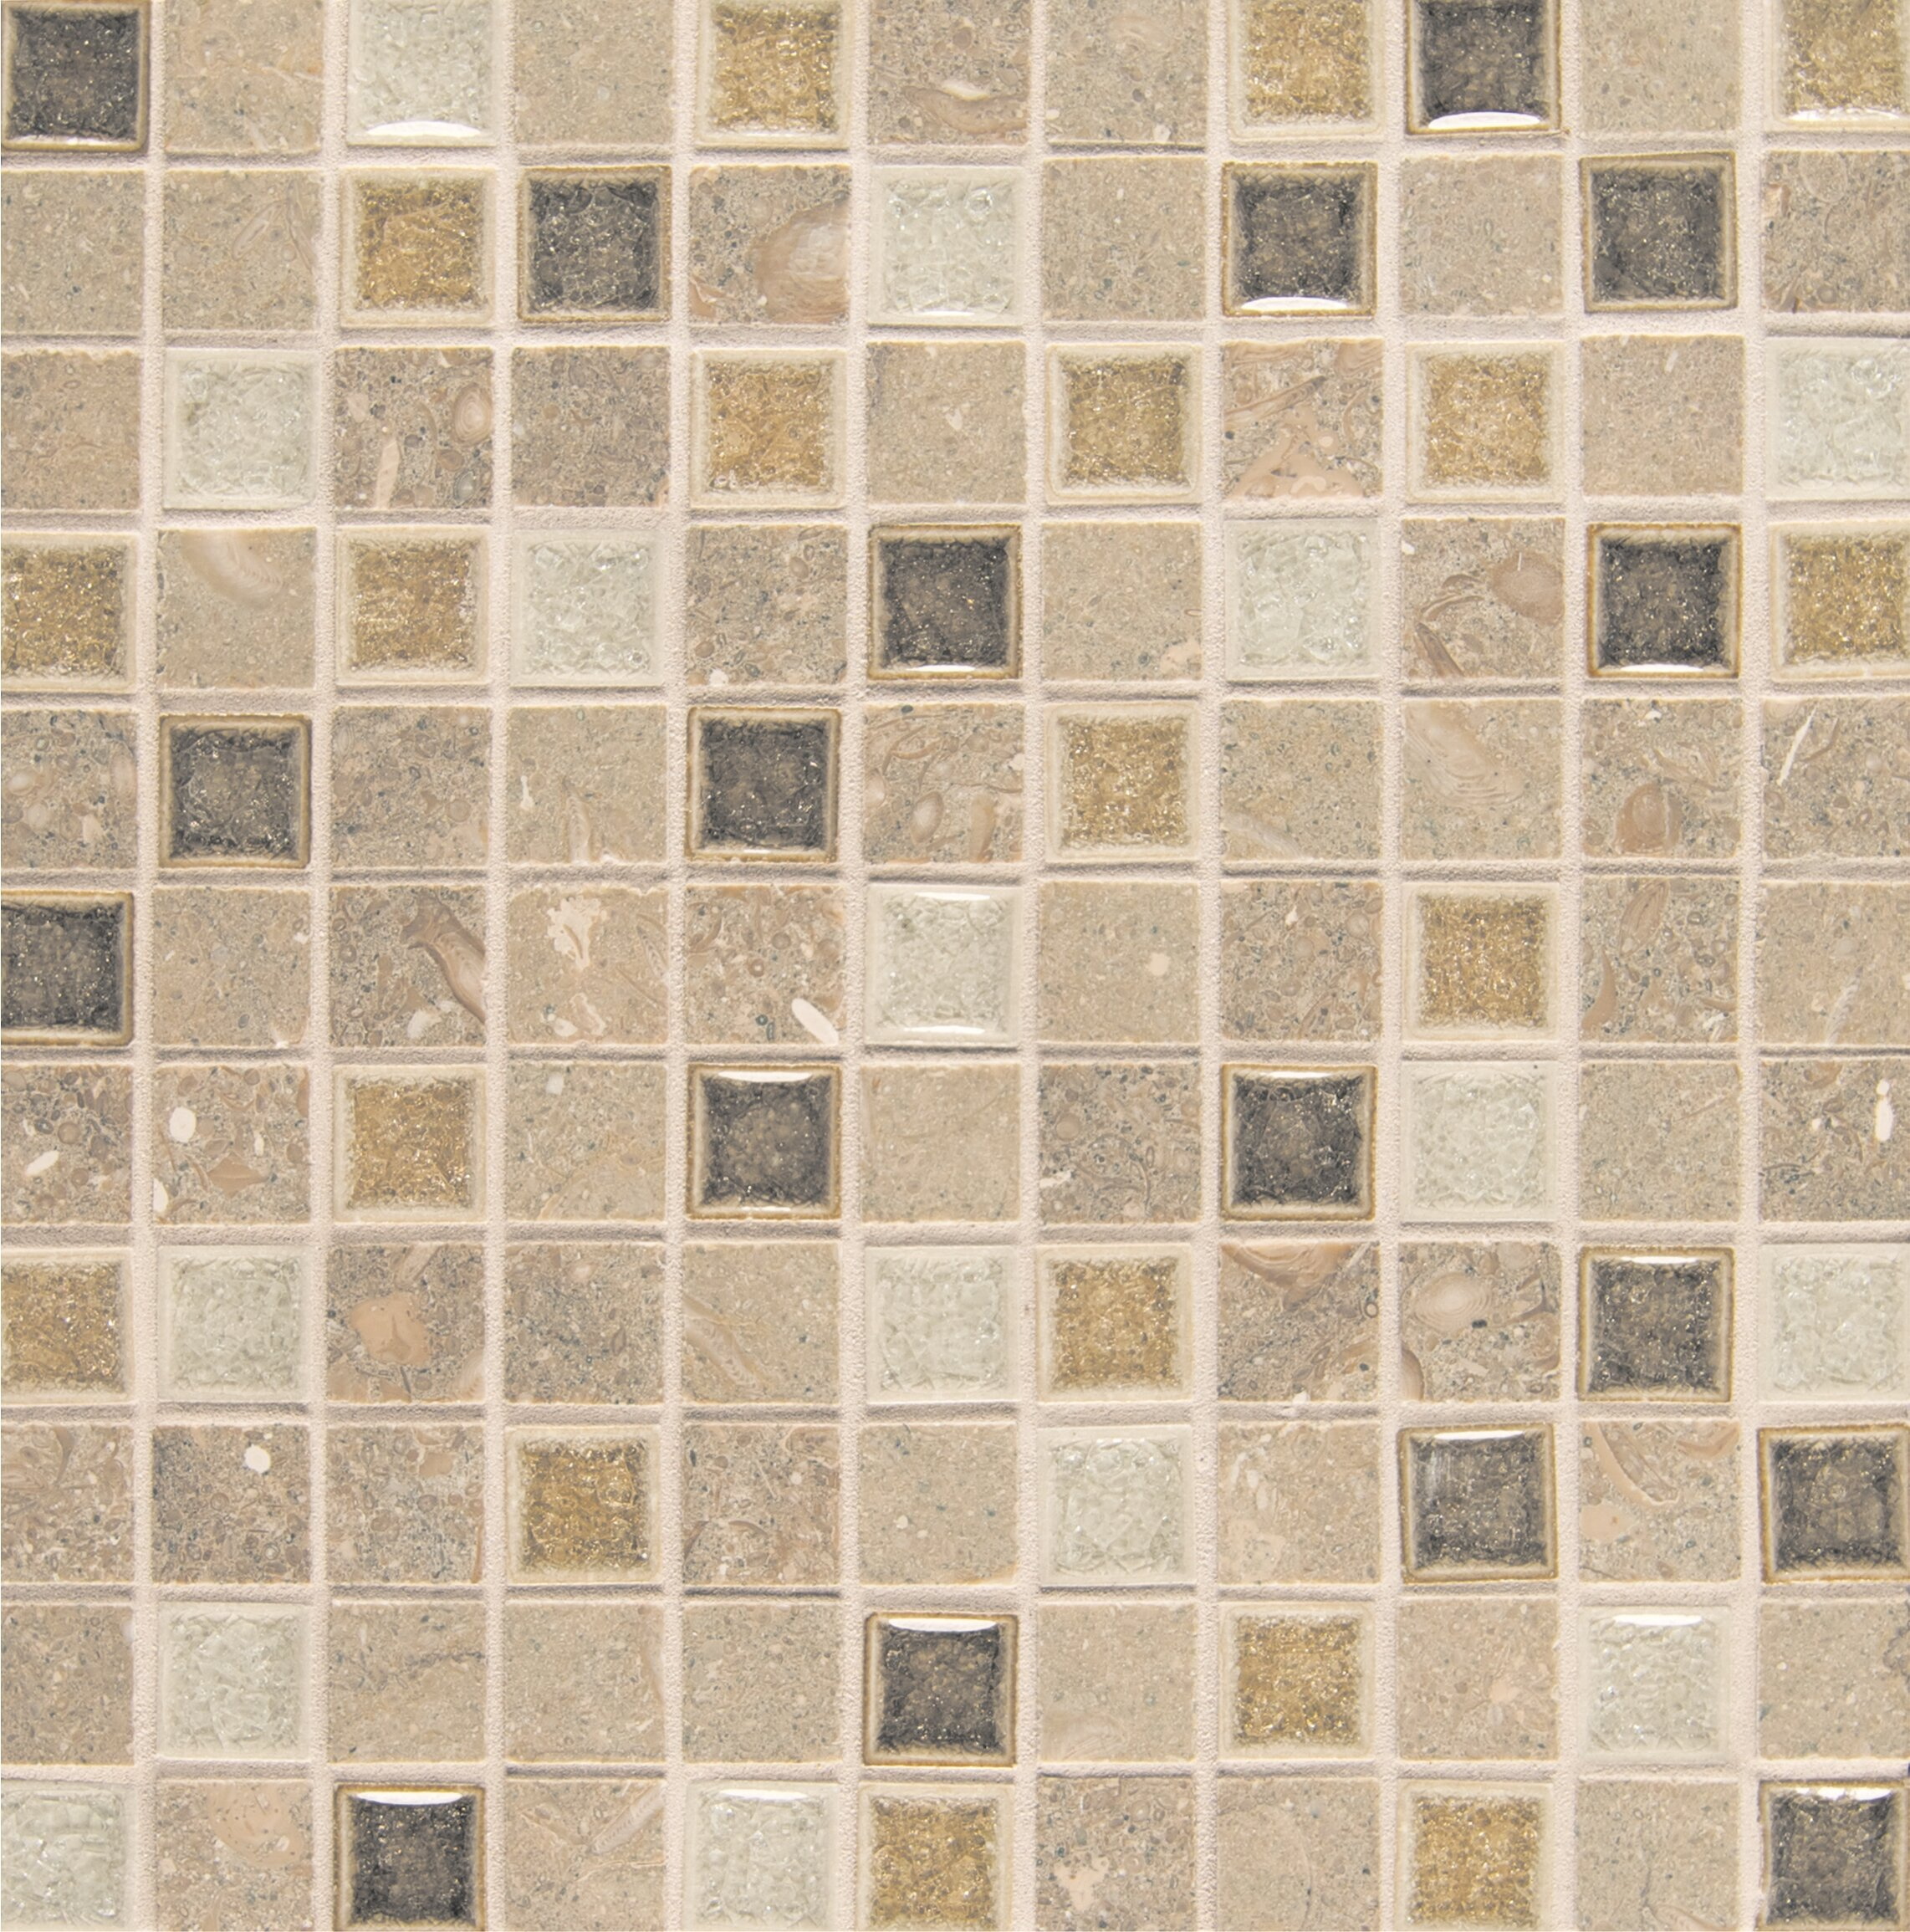 Bedrosians Kismet 1 X 1 Glass Mosaic Tile In Joy Wayfair